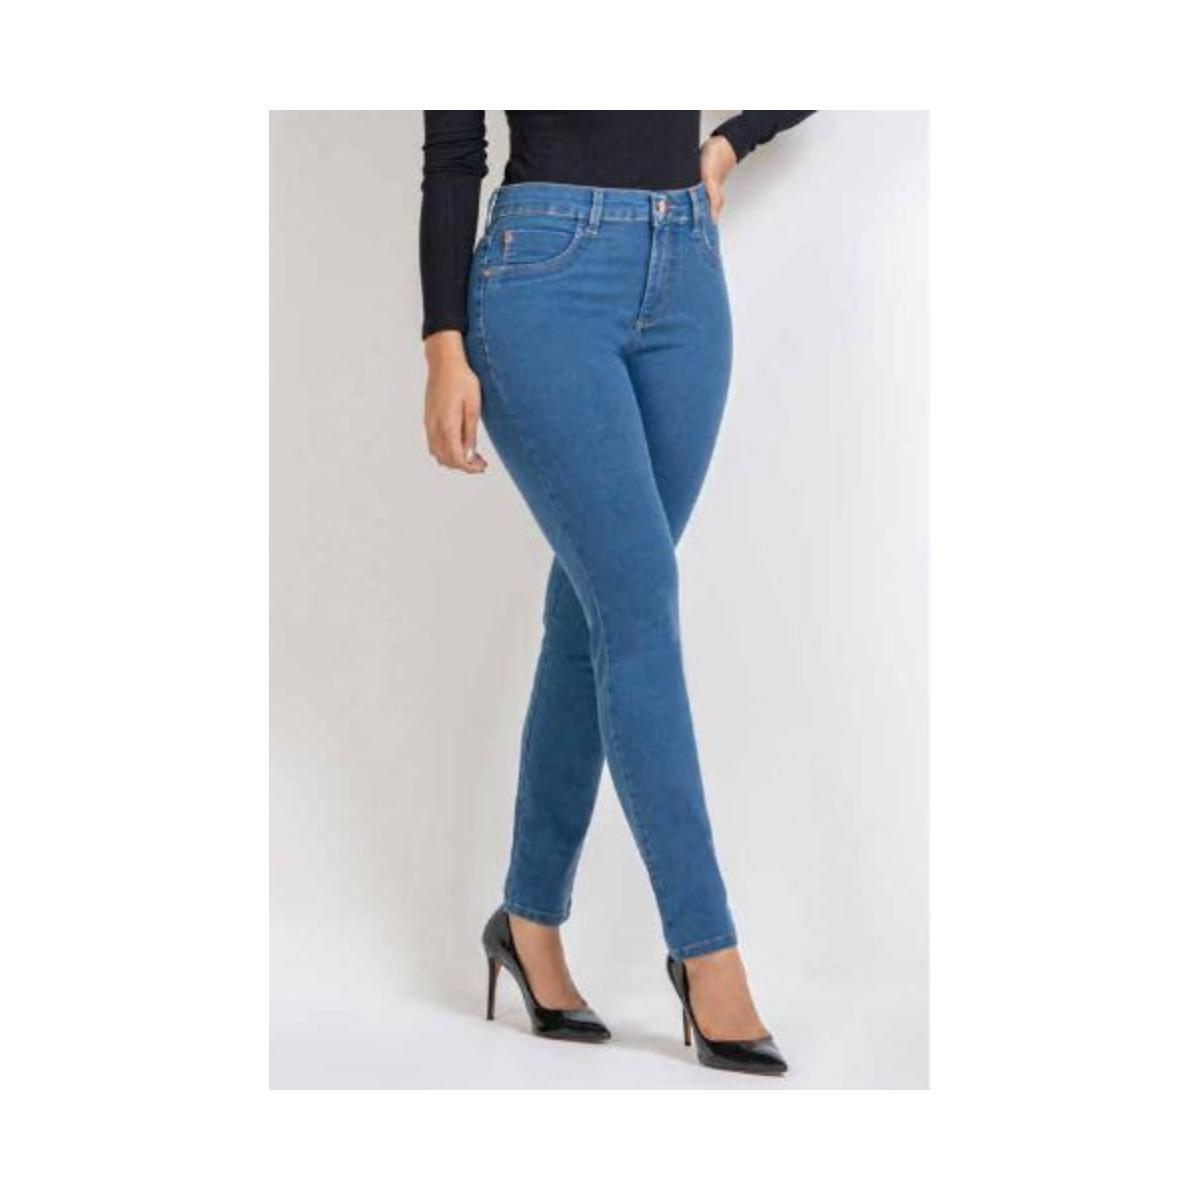 Calça Feminina Kacolako K21053 Jeans